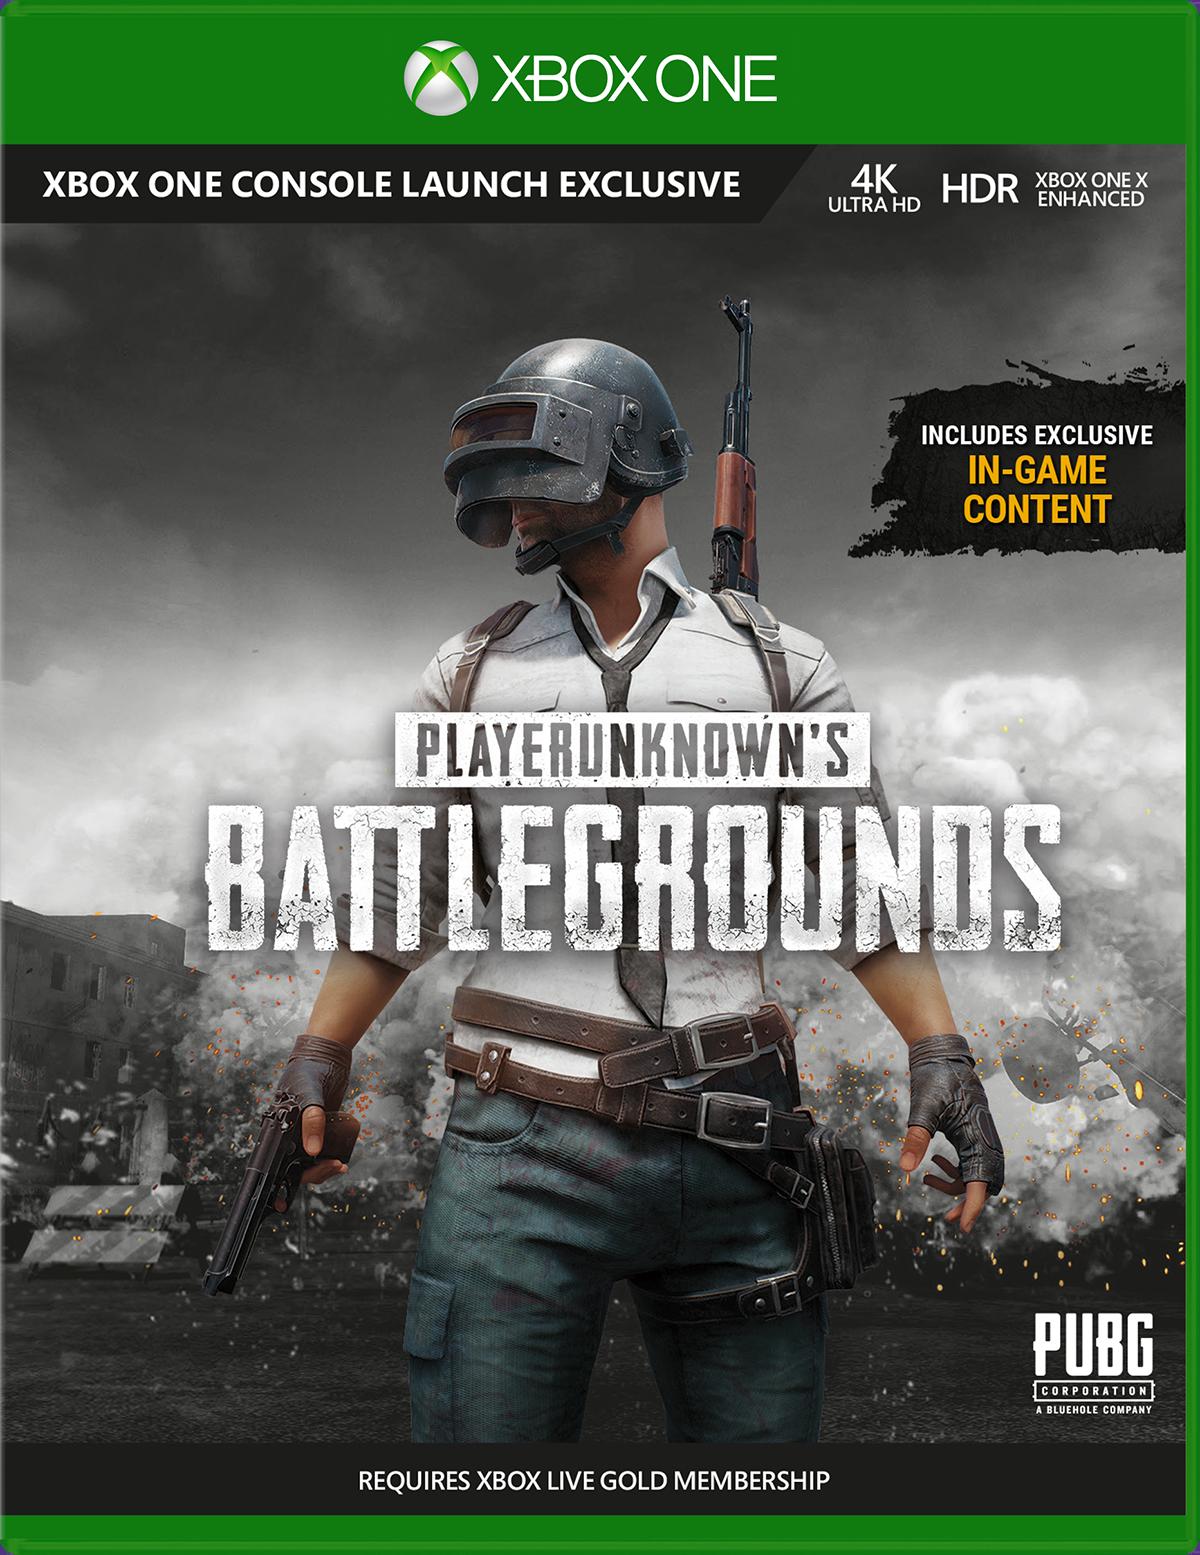 PLAYERUNKNOWN'S BATTLEGROUNDS 1.0 — grafika z gry